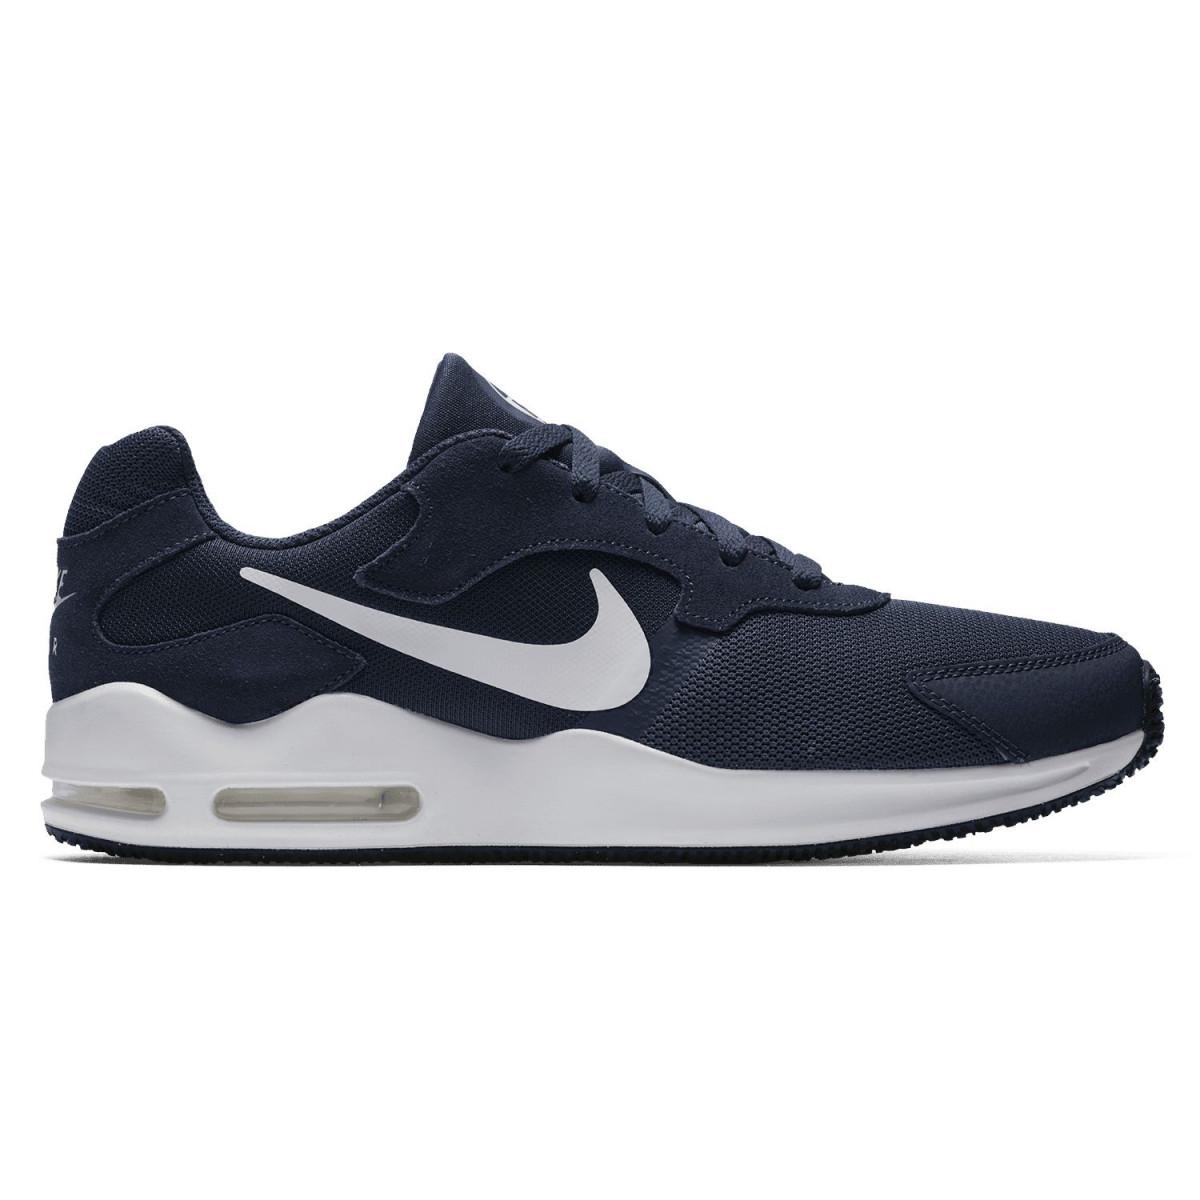 newest collection 80de7 ac462 Zapatillas Nike Air Max Guile